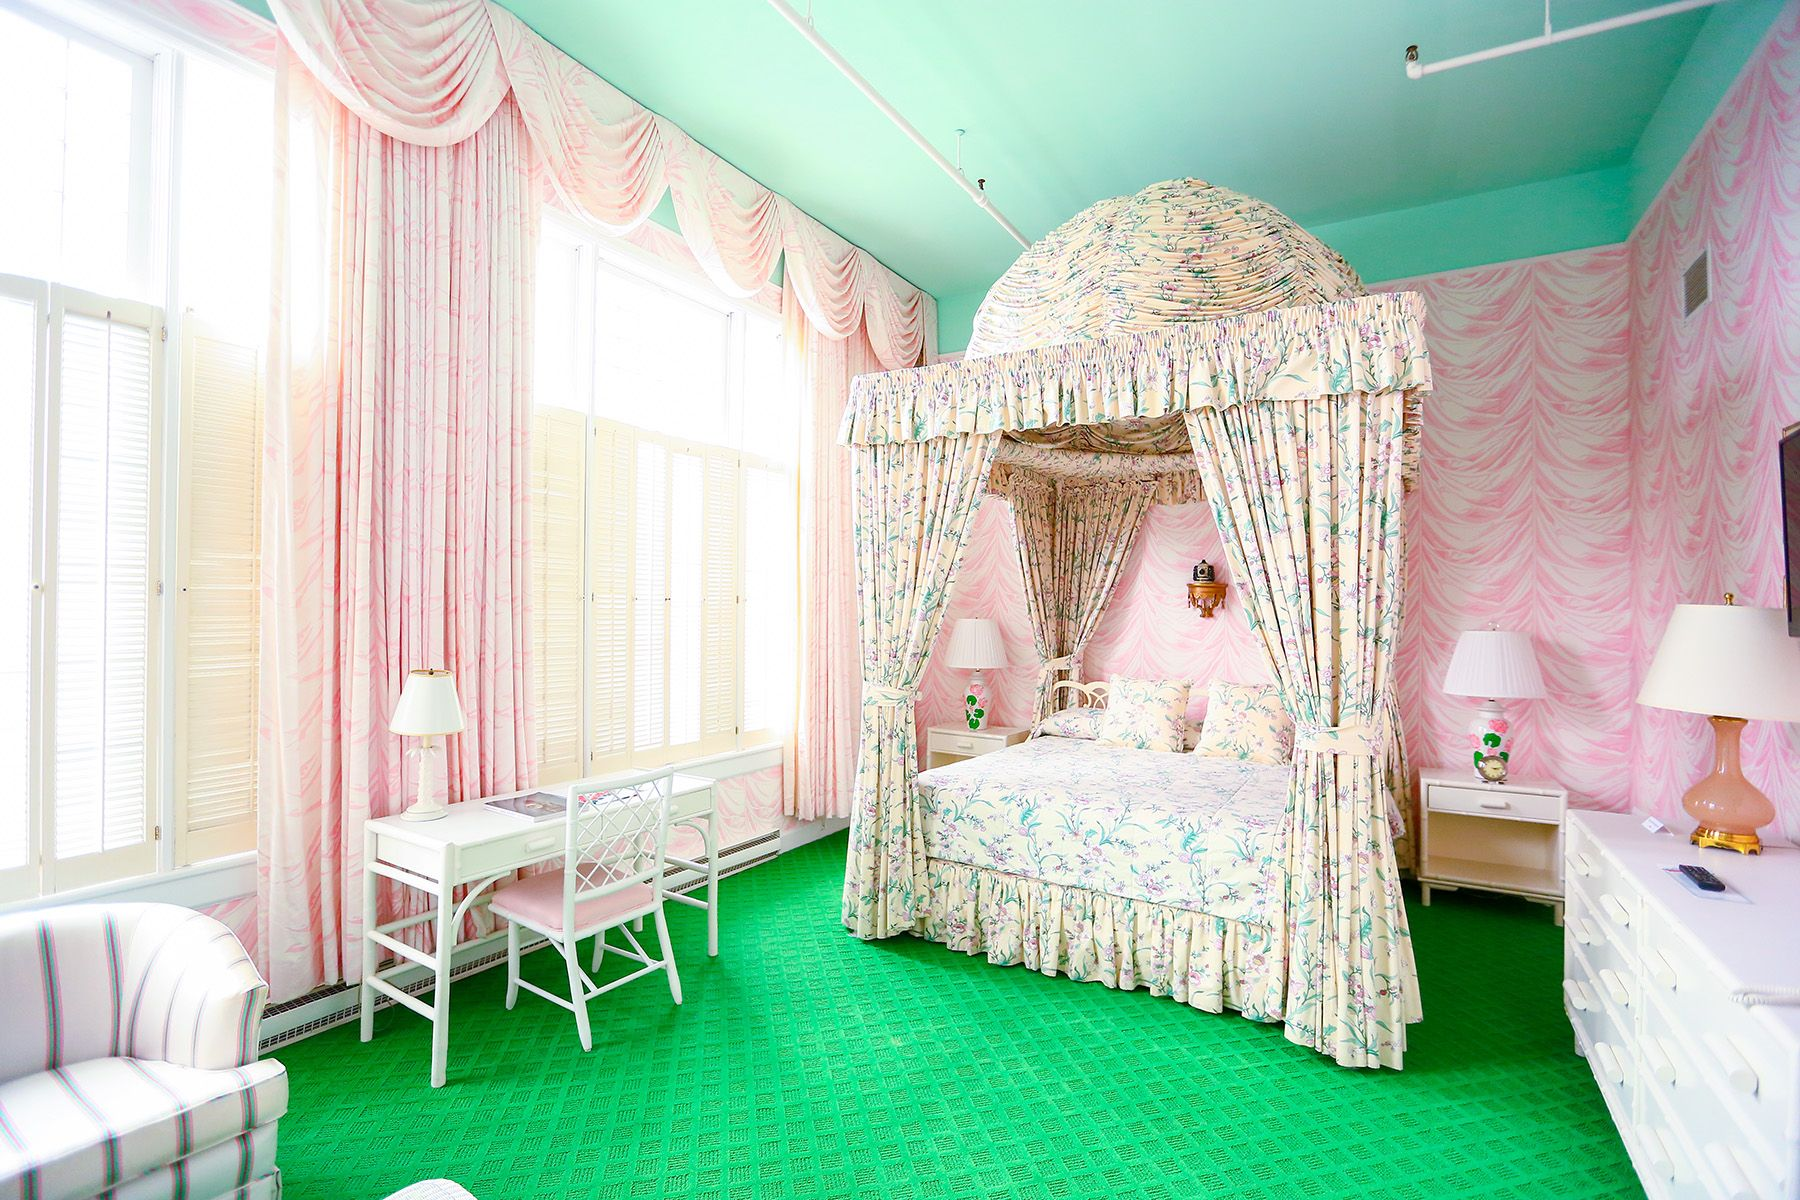 Grand Hotel Tiffany Suite Interiors Grandhotelmichigan Grandhotel Mackinacisland Luxury Suite Grand Hotel Mackinac Island Themed Hotel Rooms Grand Hotel